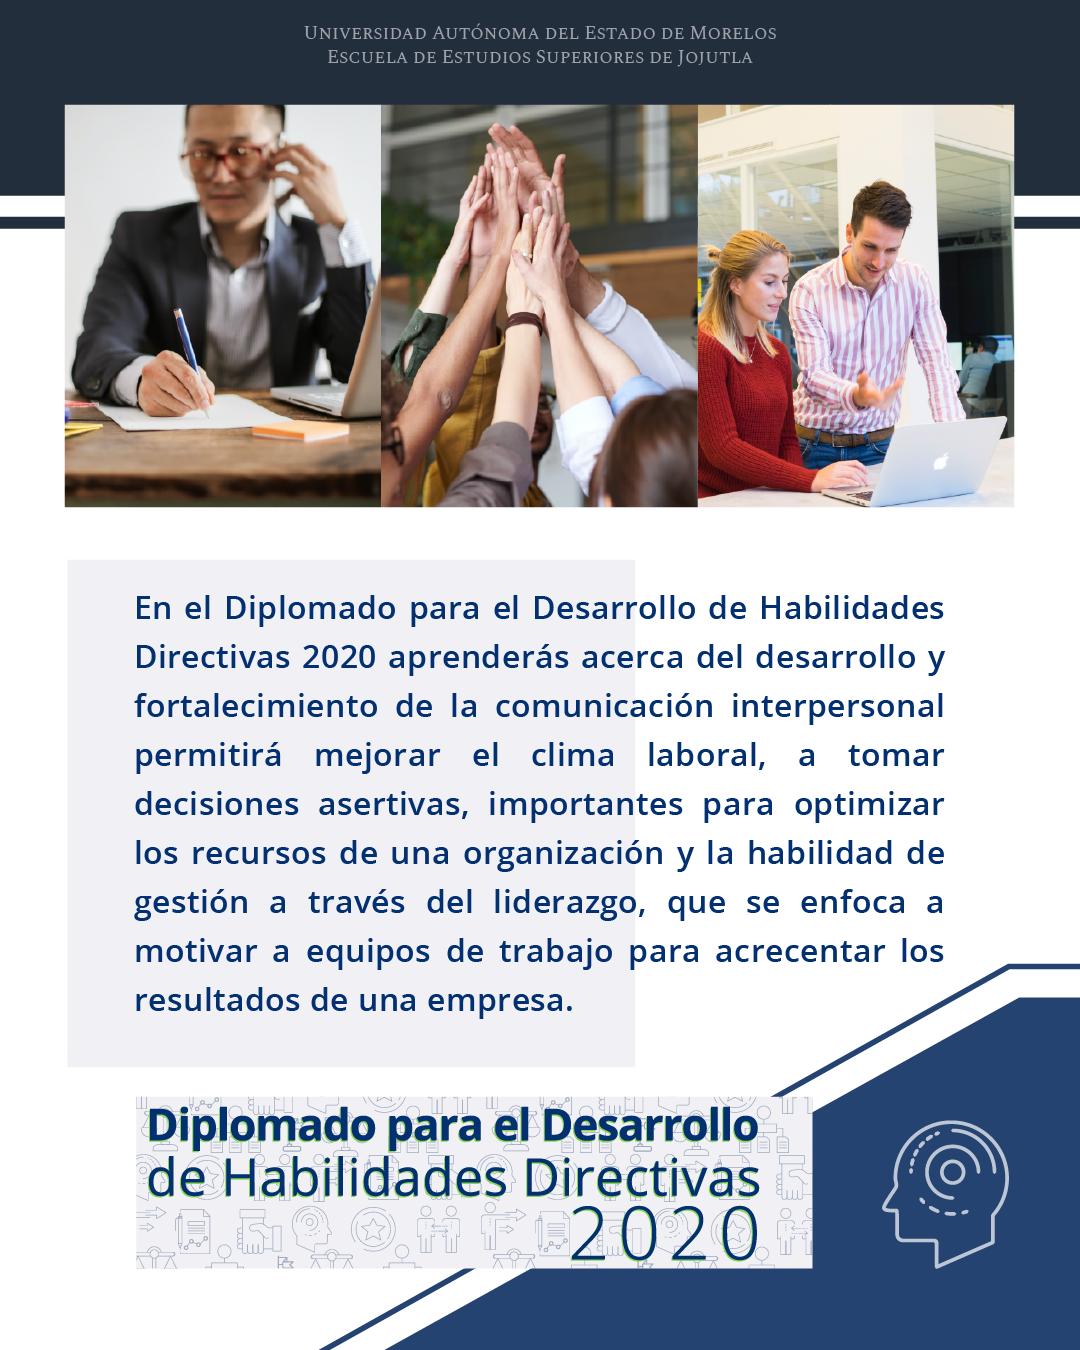 Diplomado_2020_EESJojutla_2